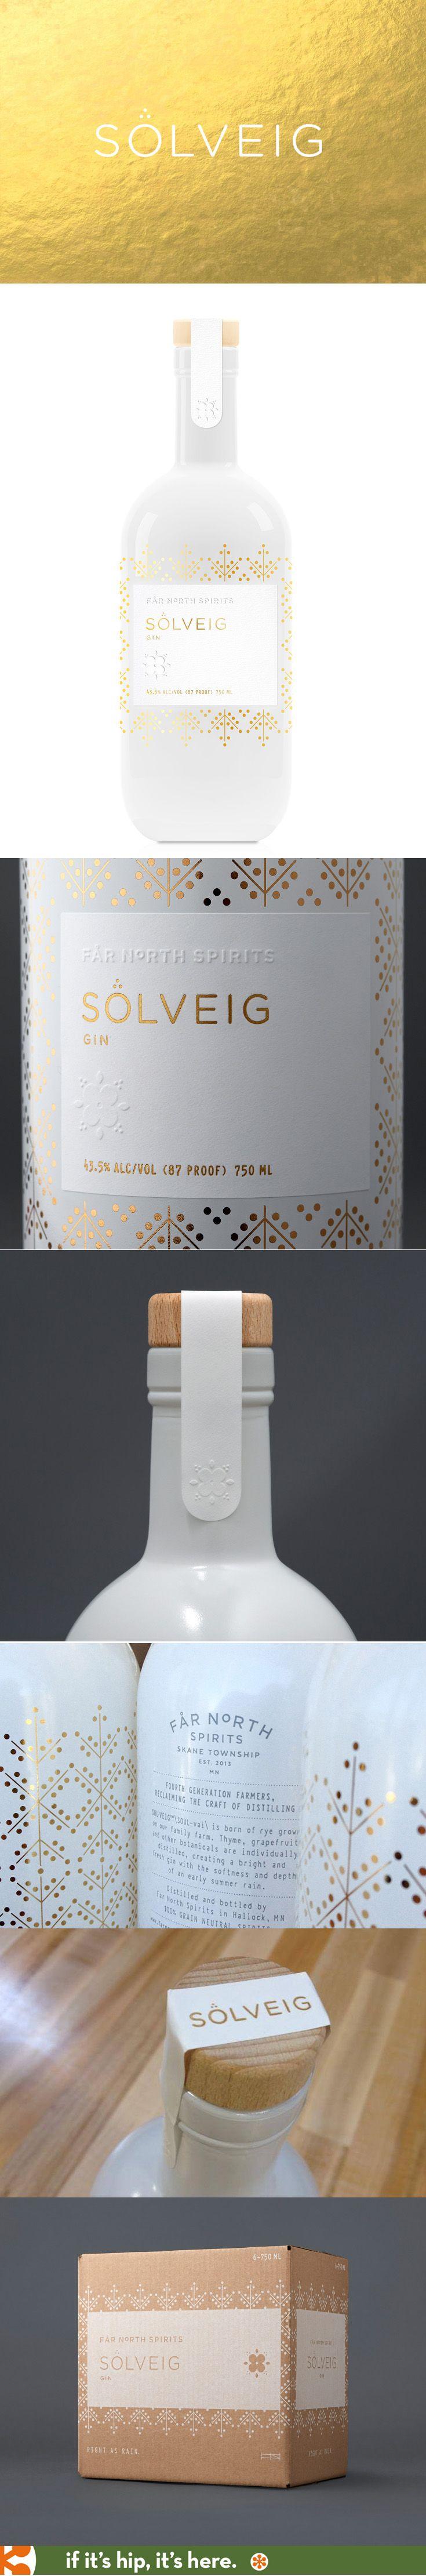 Solveig Gin bottle and package design by Jenney Stevens for Far North Spirits.